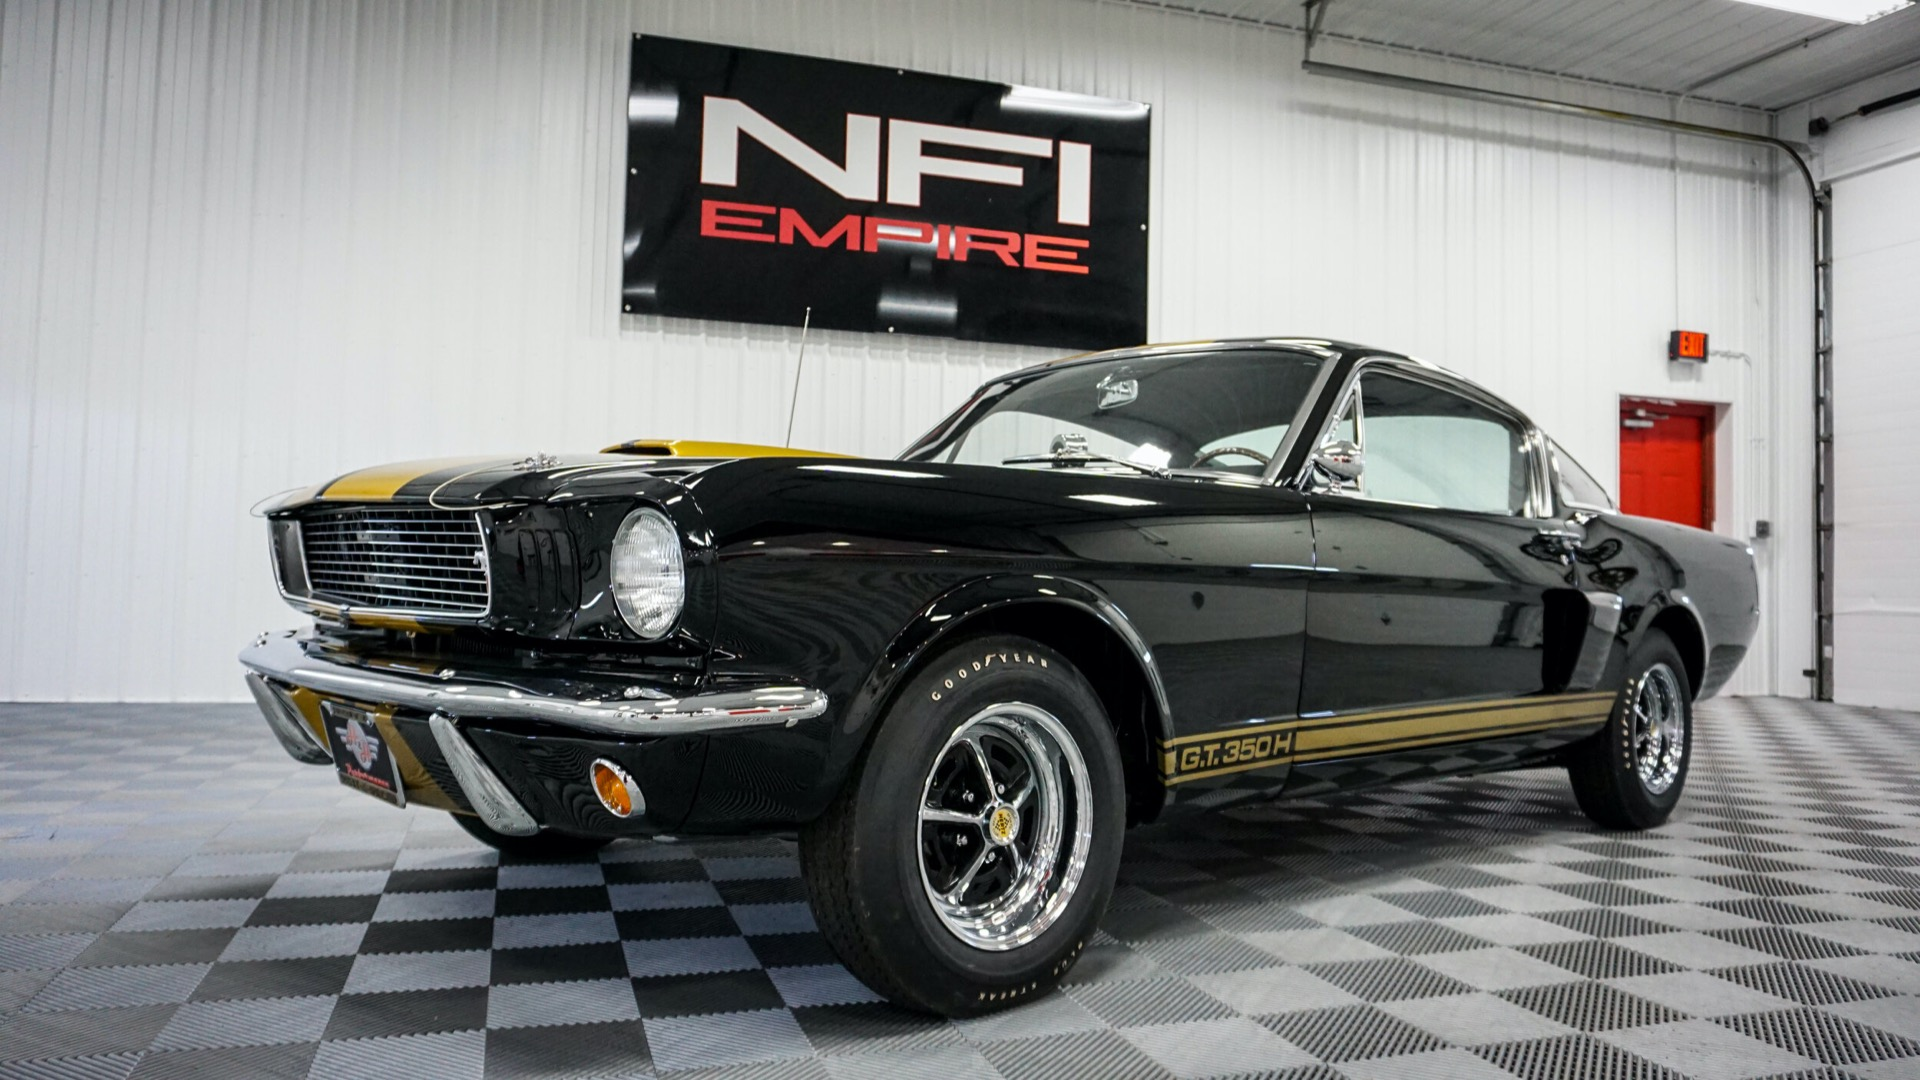 66 Mustang header image